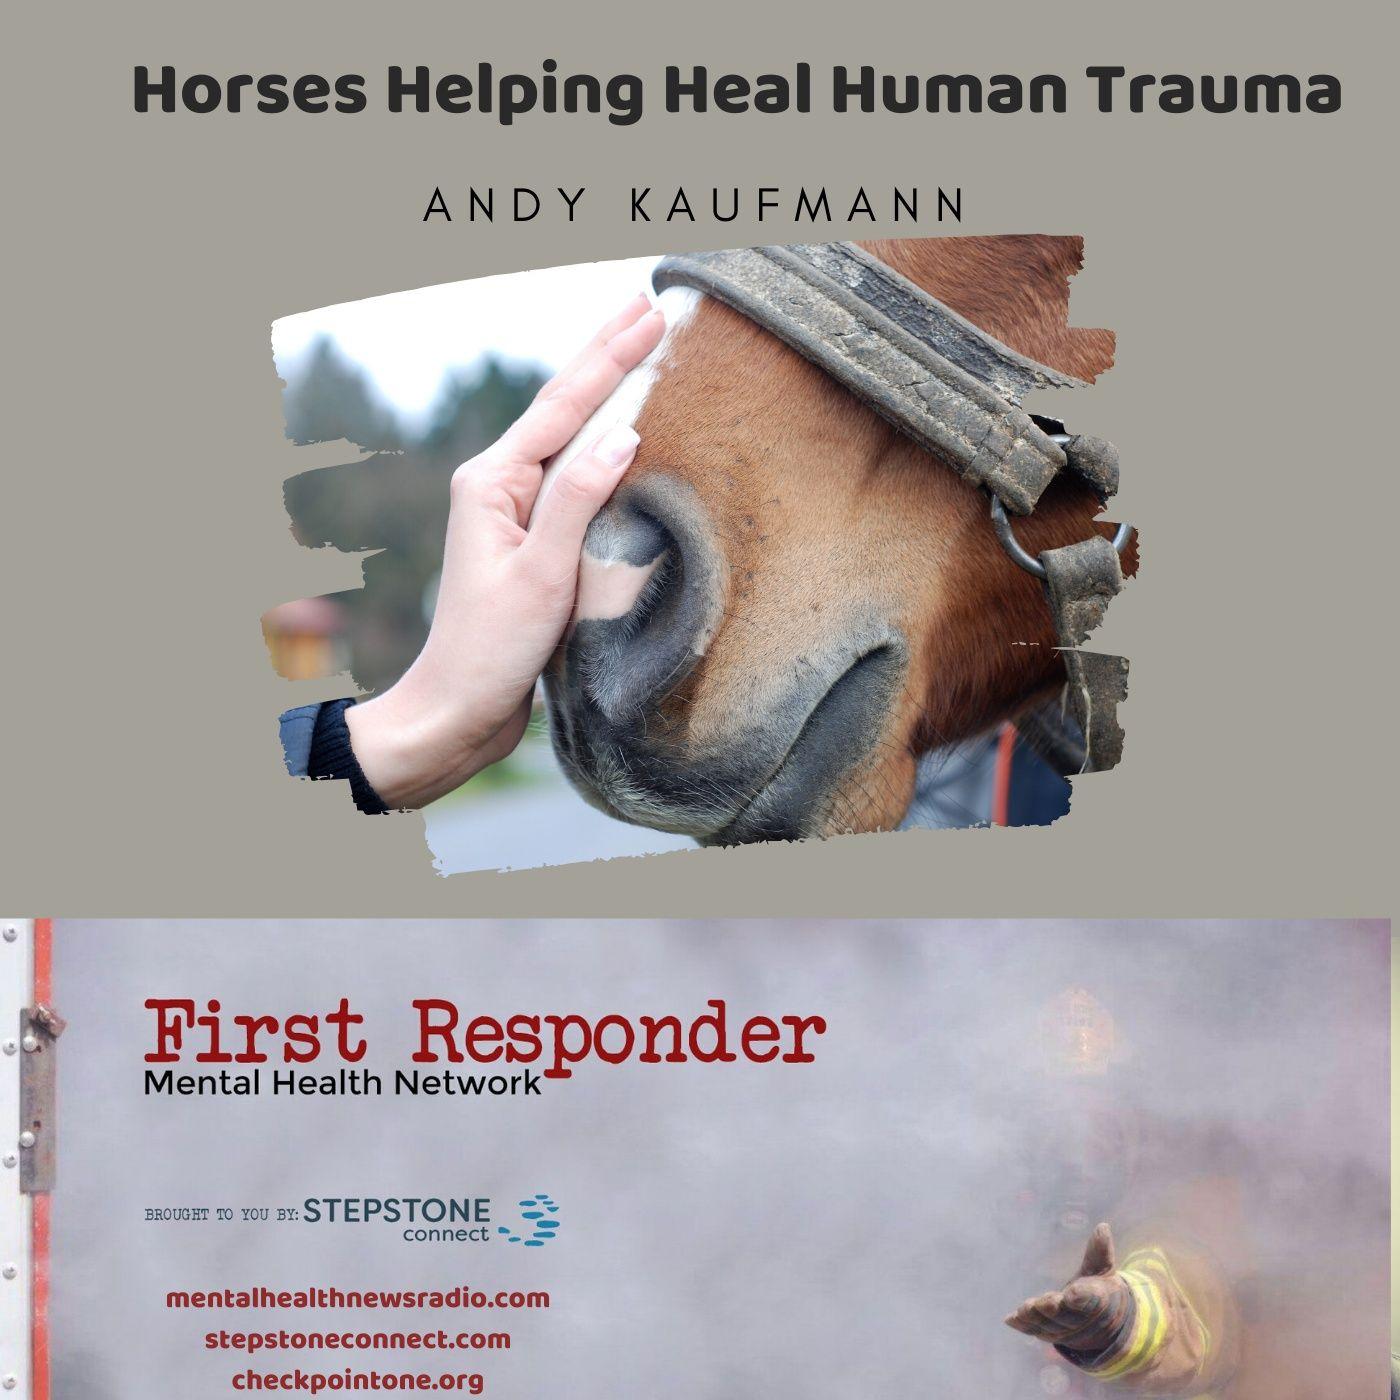 Mental Health News Radio - Horses Helping Heal Human Trauma